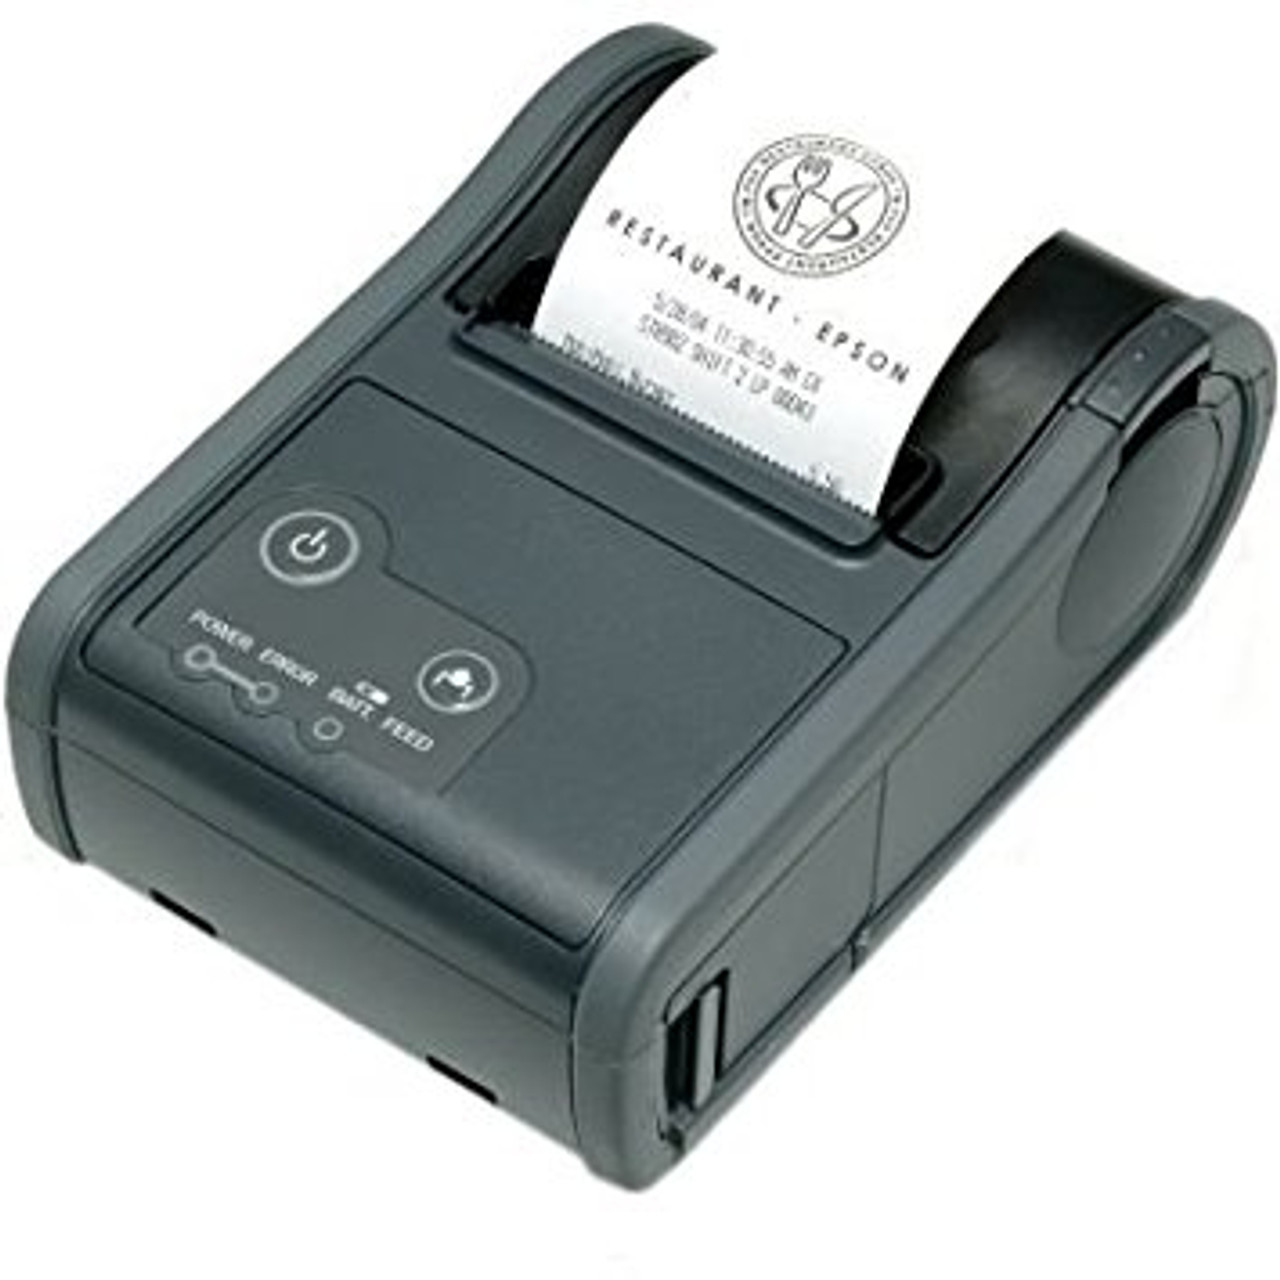 TM-P60 Epson Mobile Thermal Printer Model M196B